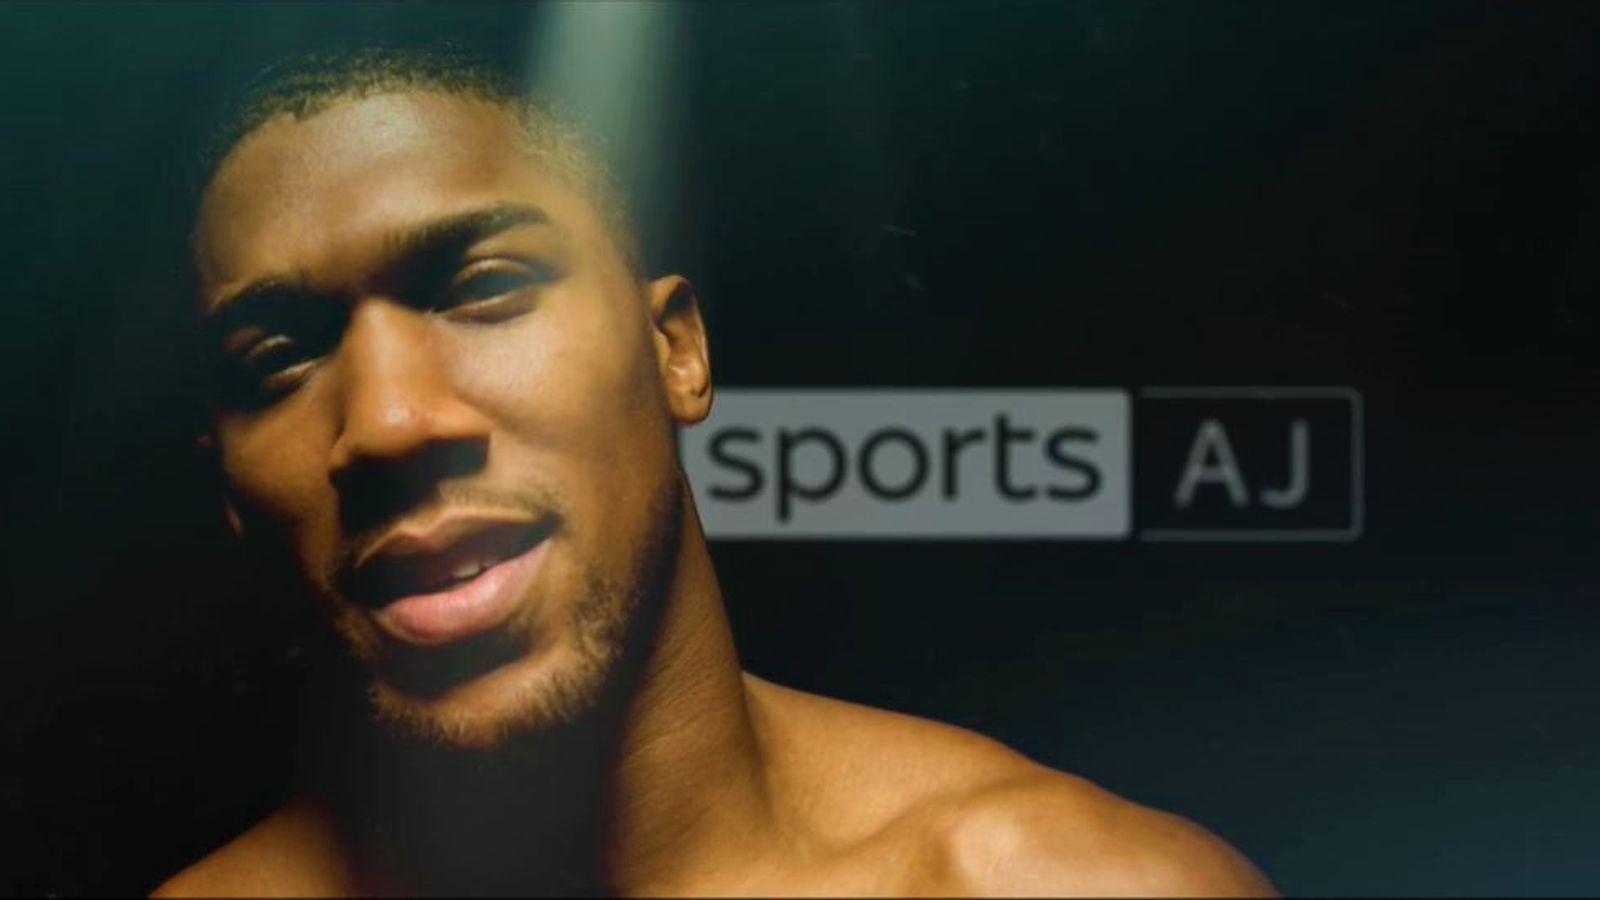 Joshua vs Pulev: Anthony Joshua will take over Sky Sports Mix as it becomes Sky Sports AJ